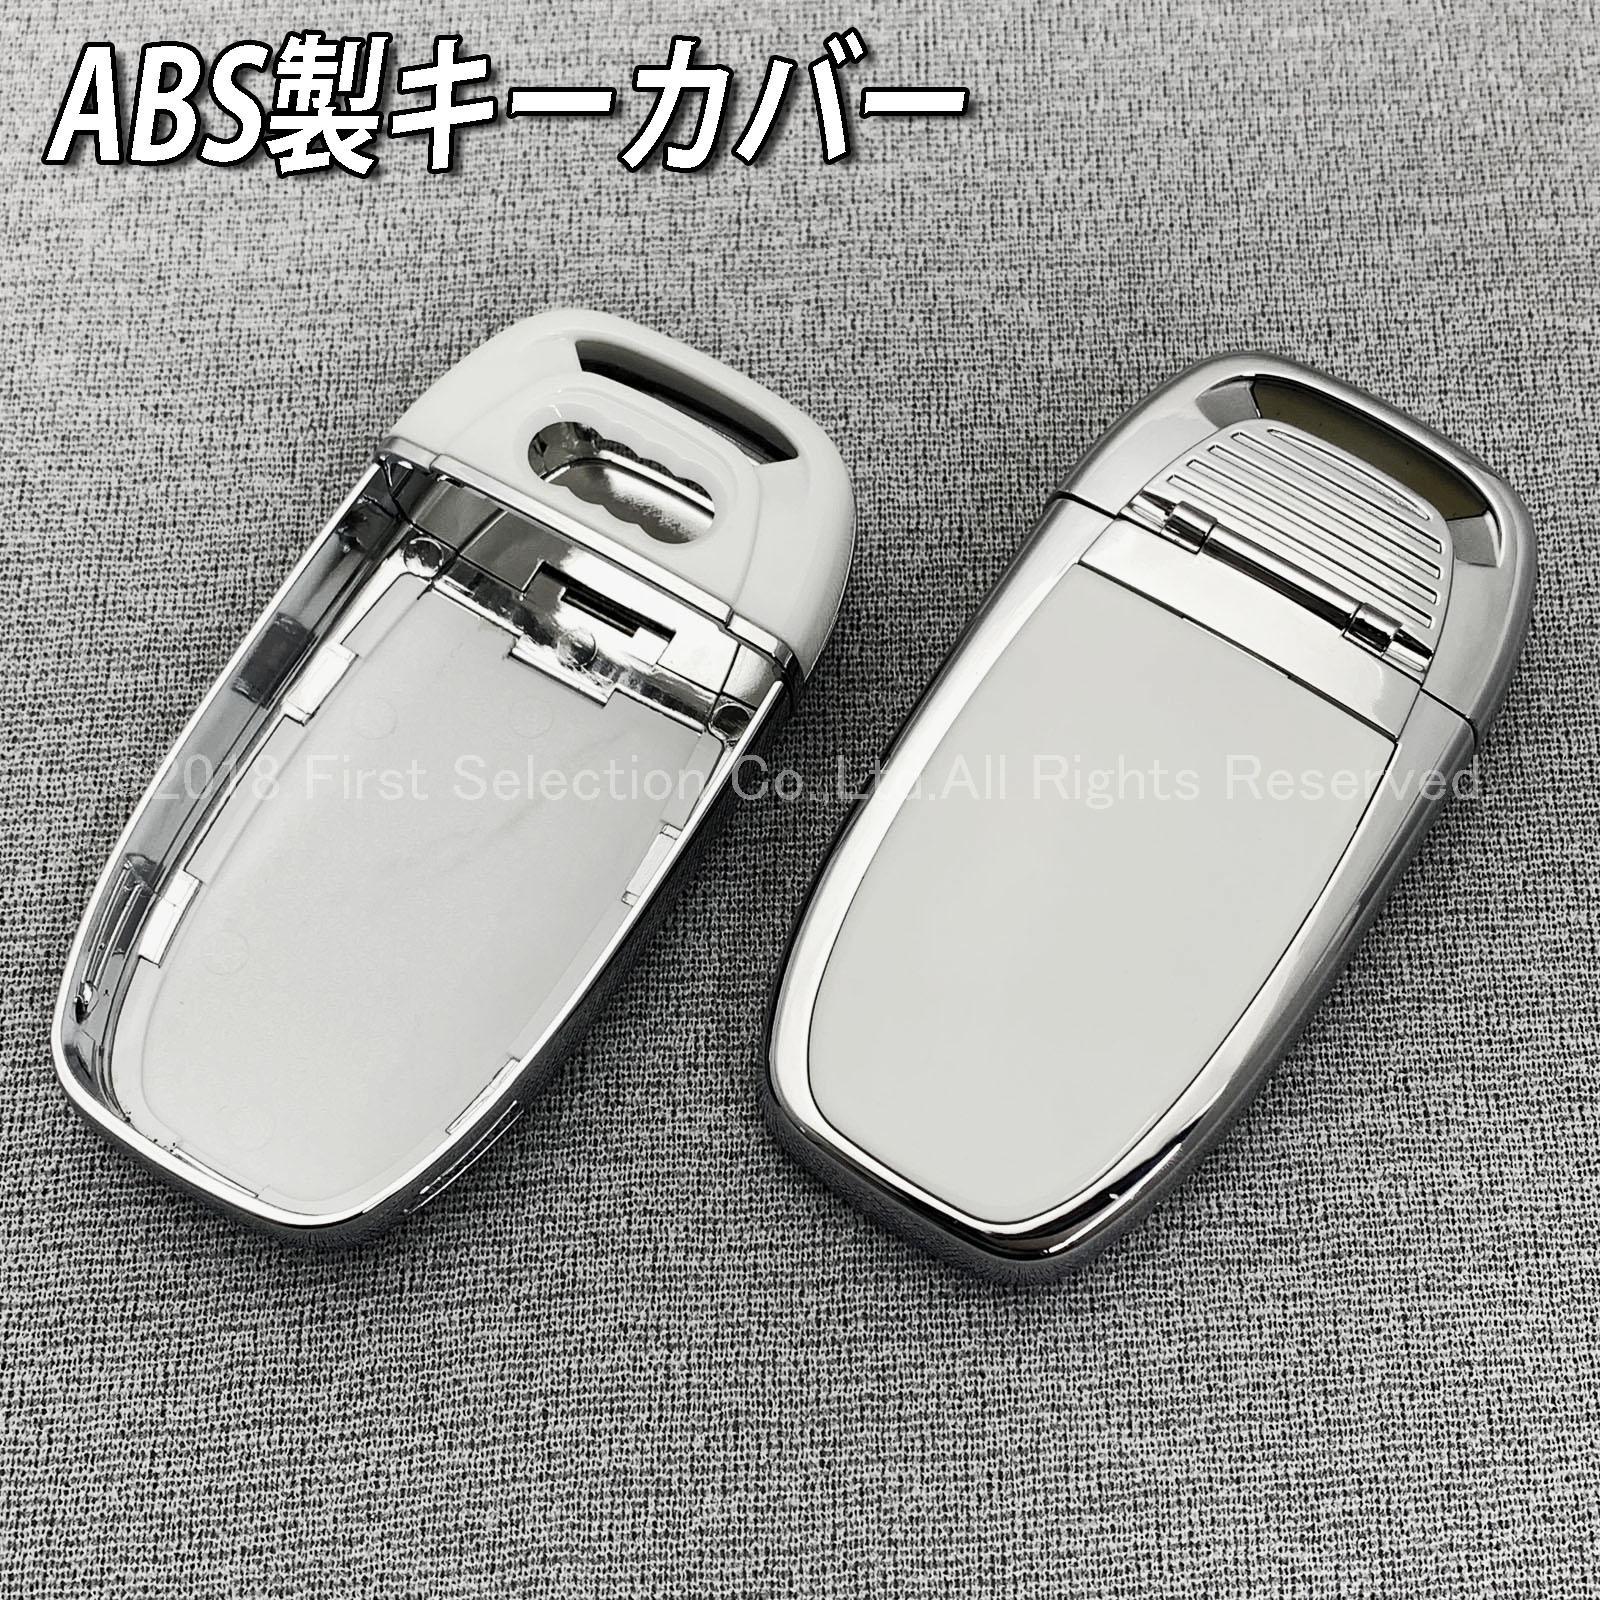 Audi アウディ スマートキー用 高品質キーカバー 白 A4 A5 A6 A7 A8 S4 S5 S6 S7 S8 RS4 RS5 RS6 RS7 Q5 Q7 SQ5